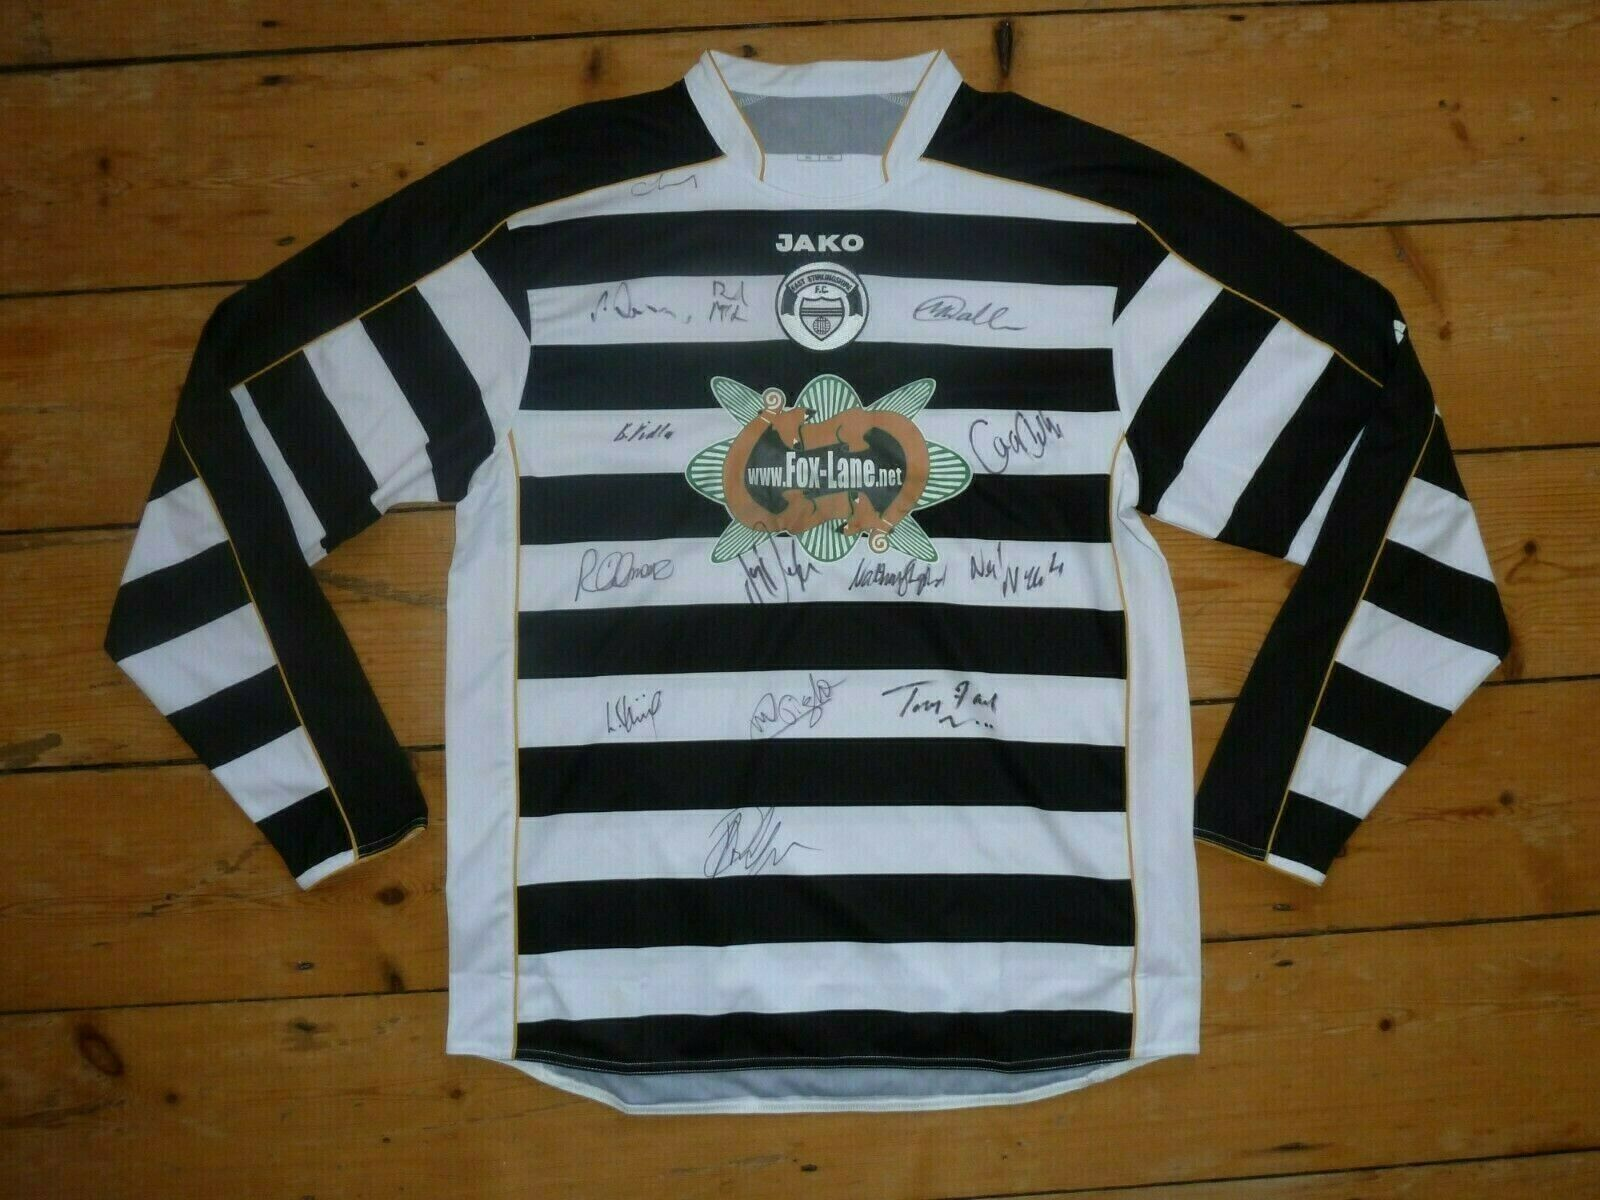 Aigned East Stirlingshire Fußball Trikot Fußball Shirt Zuhause Neu mit Etikett  | Verrückter Preis, Birmingham